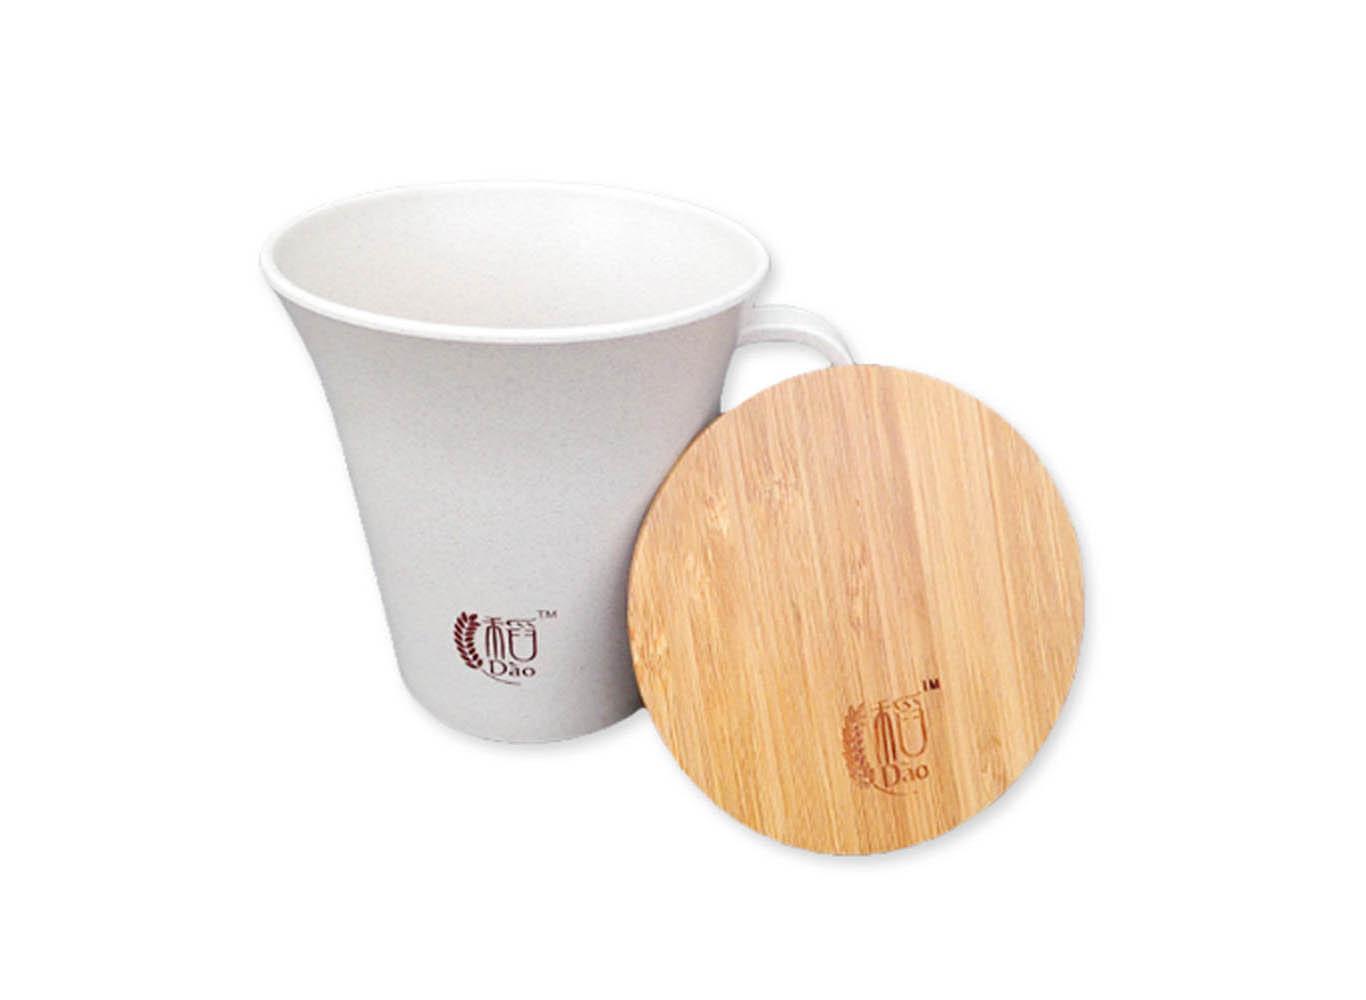 Biodegradable Fiber Mug with Bamboo Lid